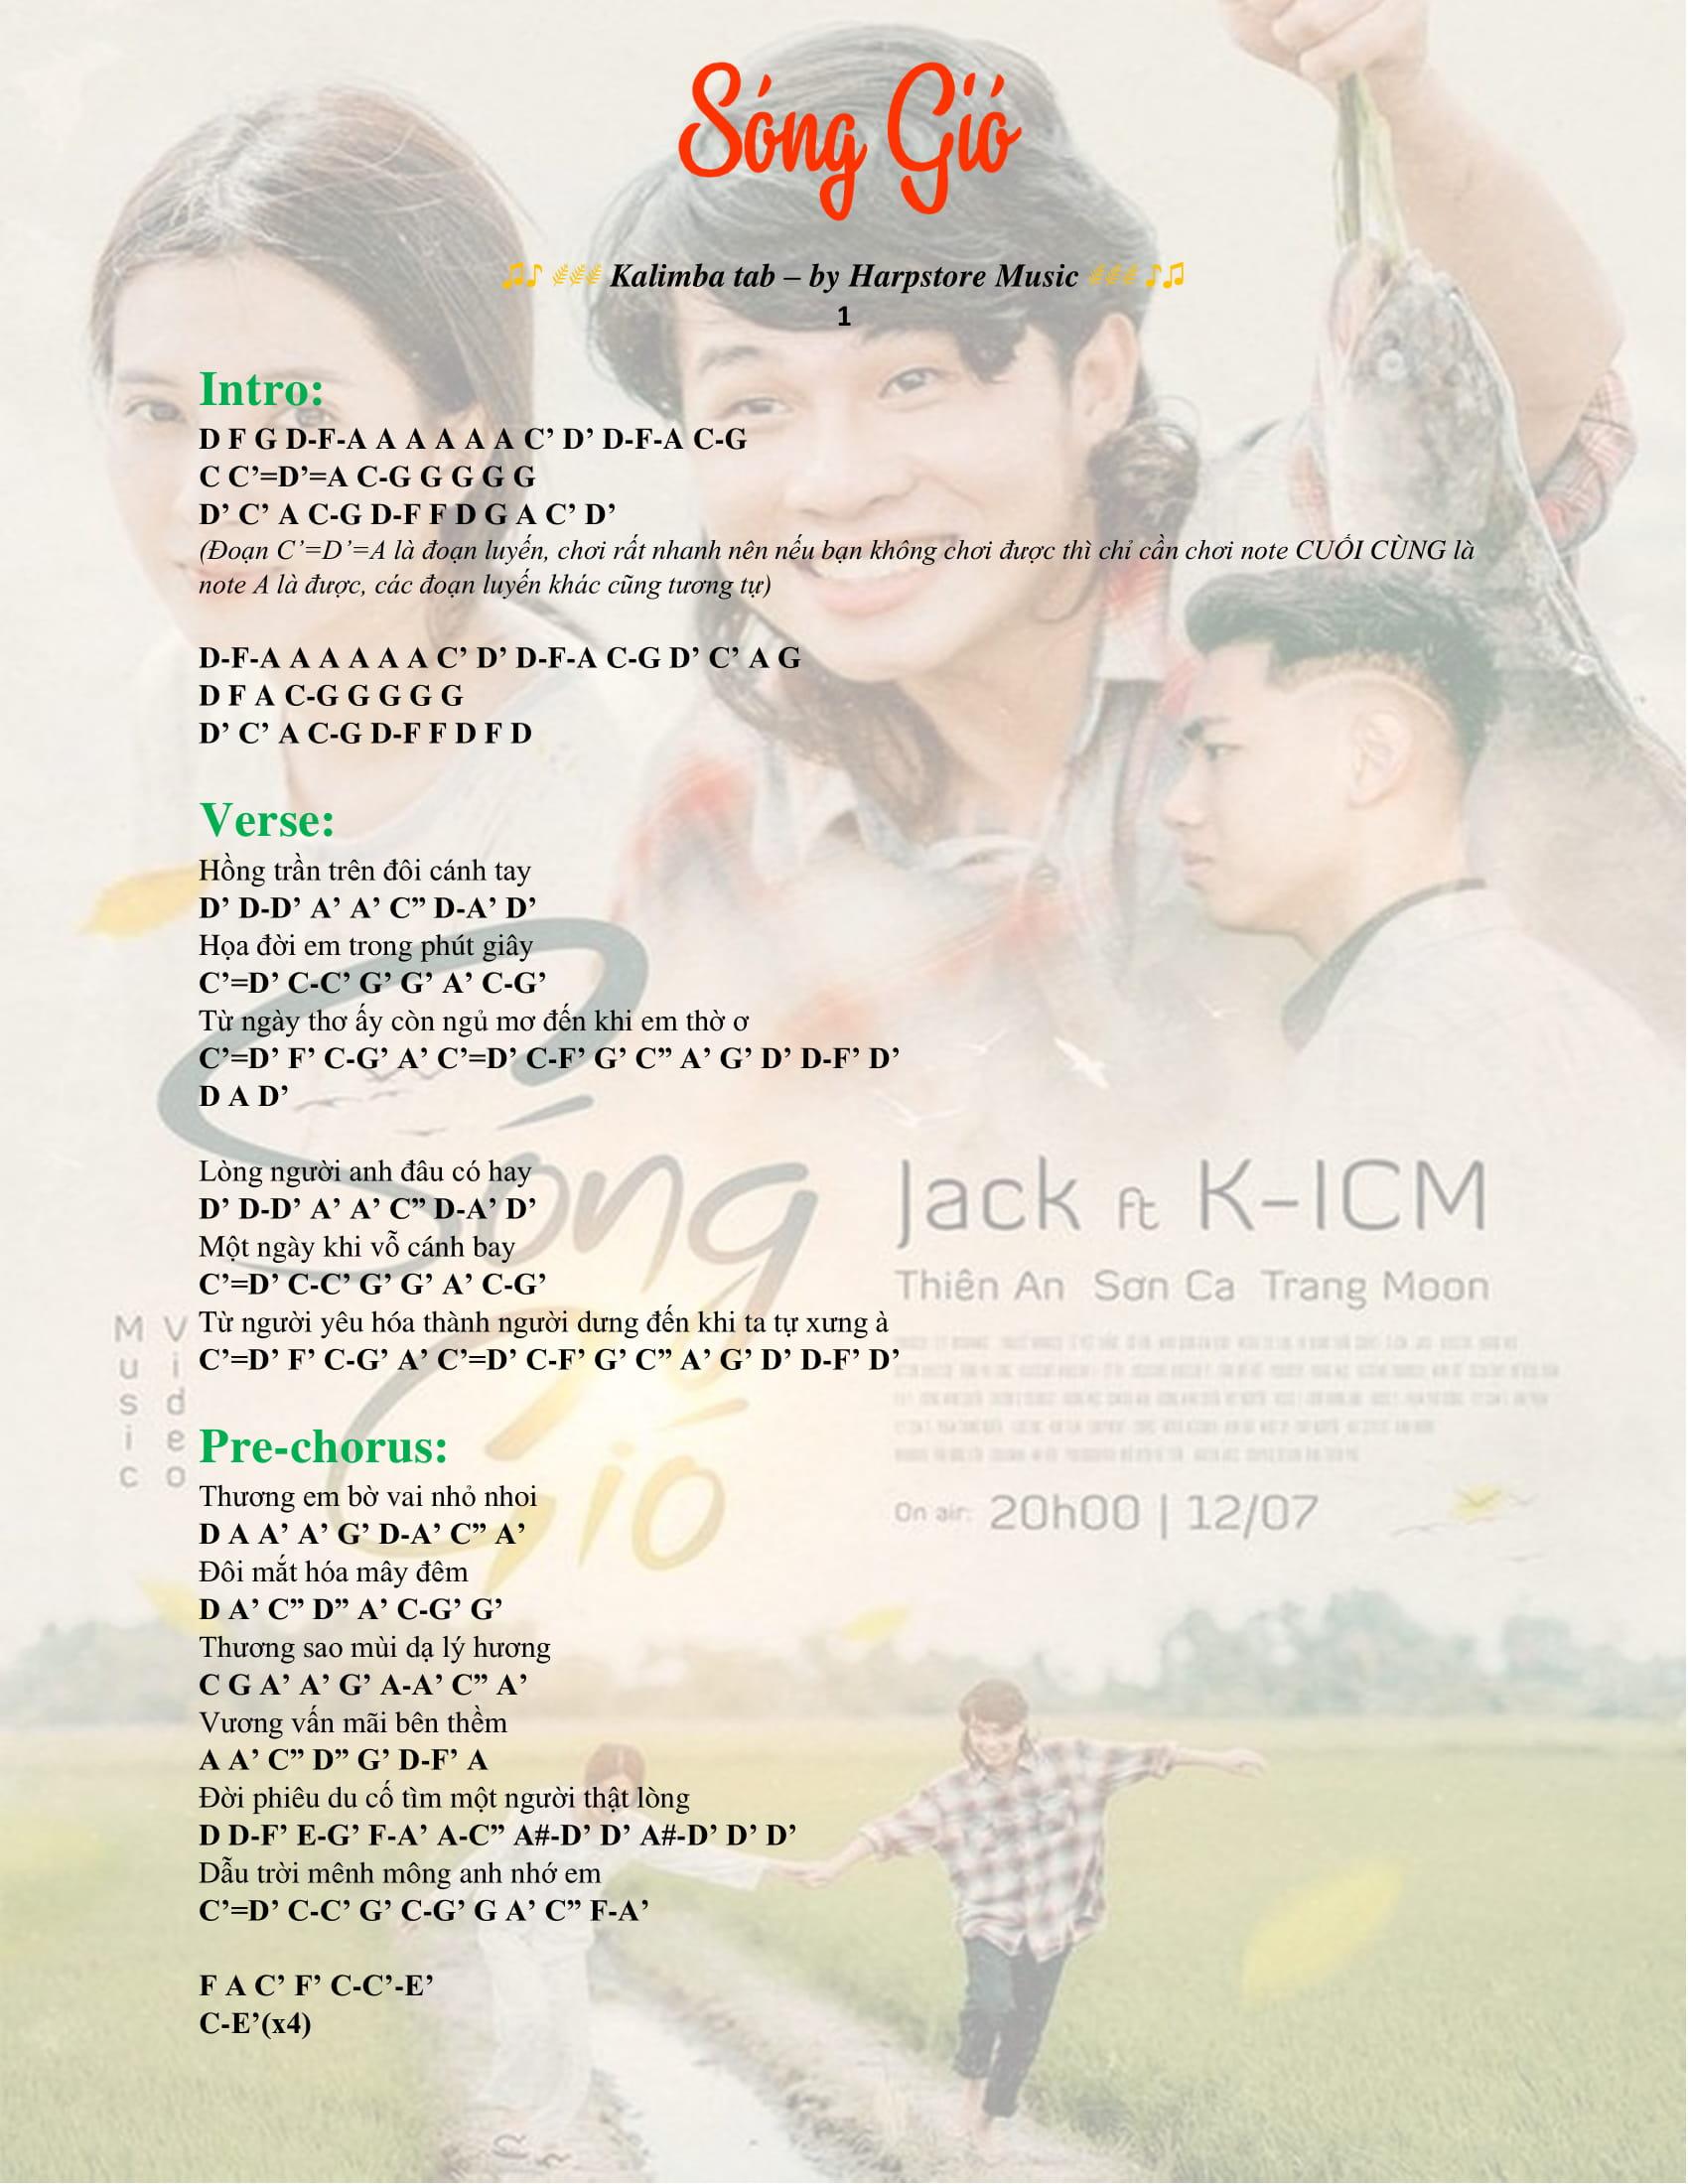 Kalimb tab chanson chanson kicm jack 01